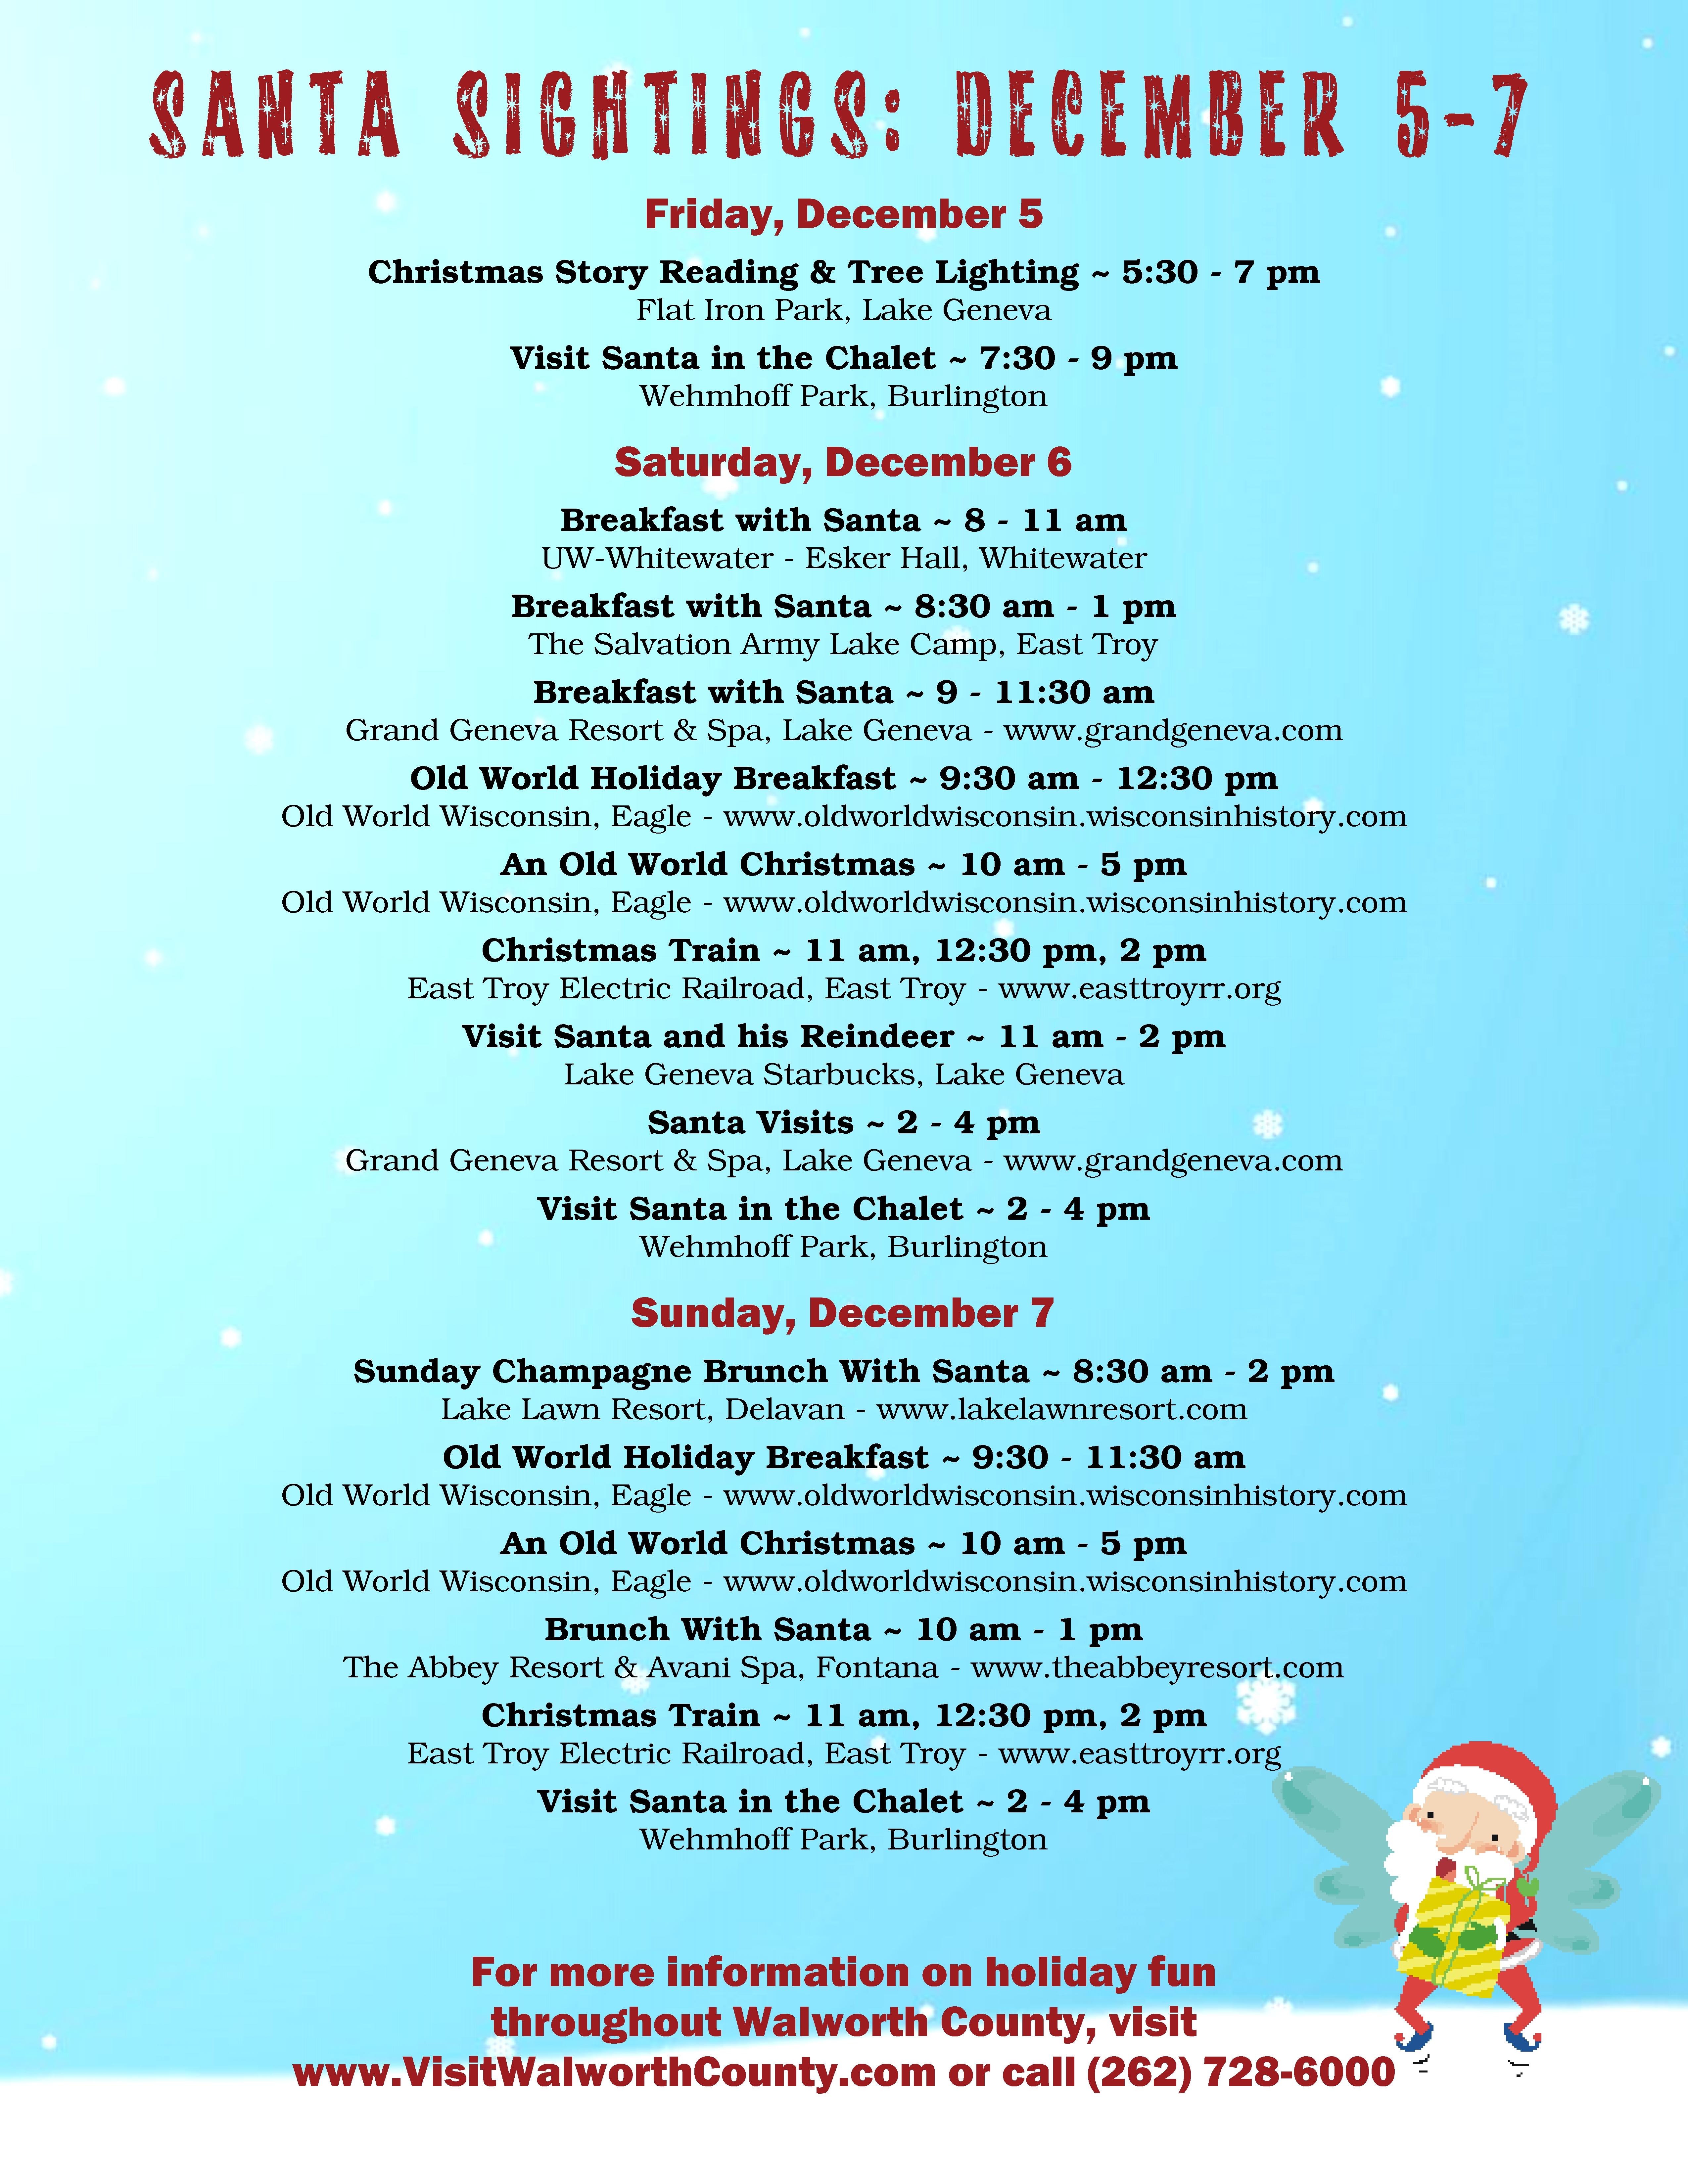 2014 Santa Sightings